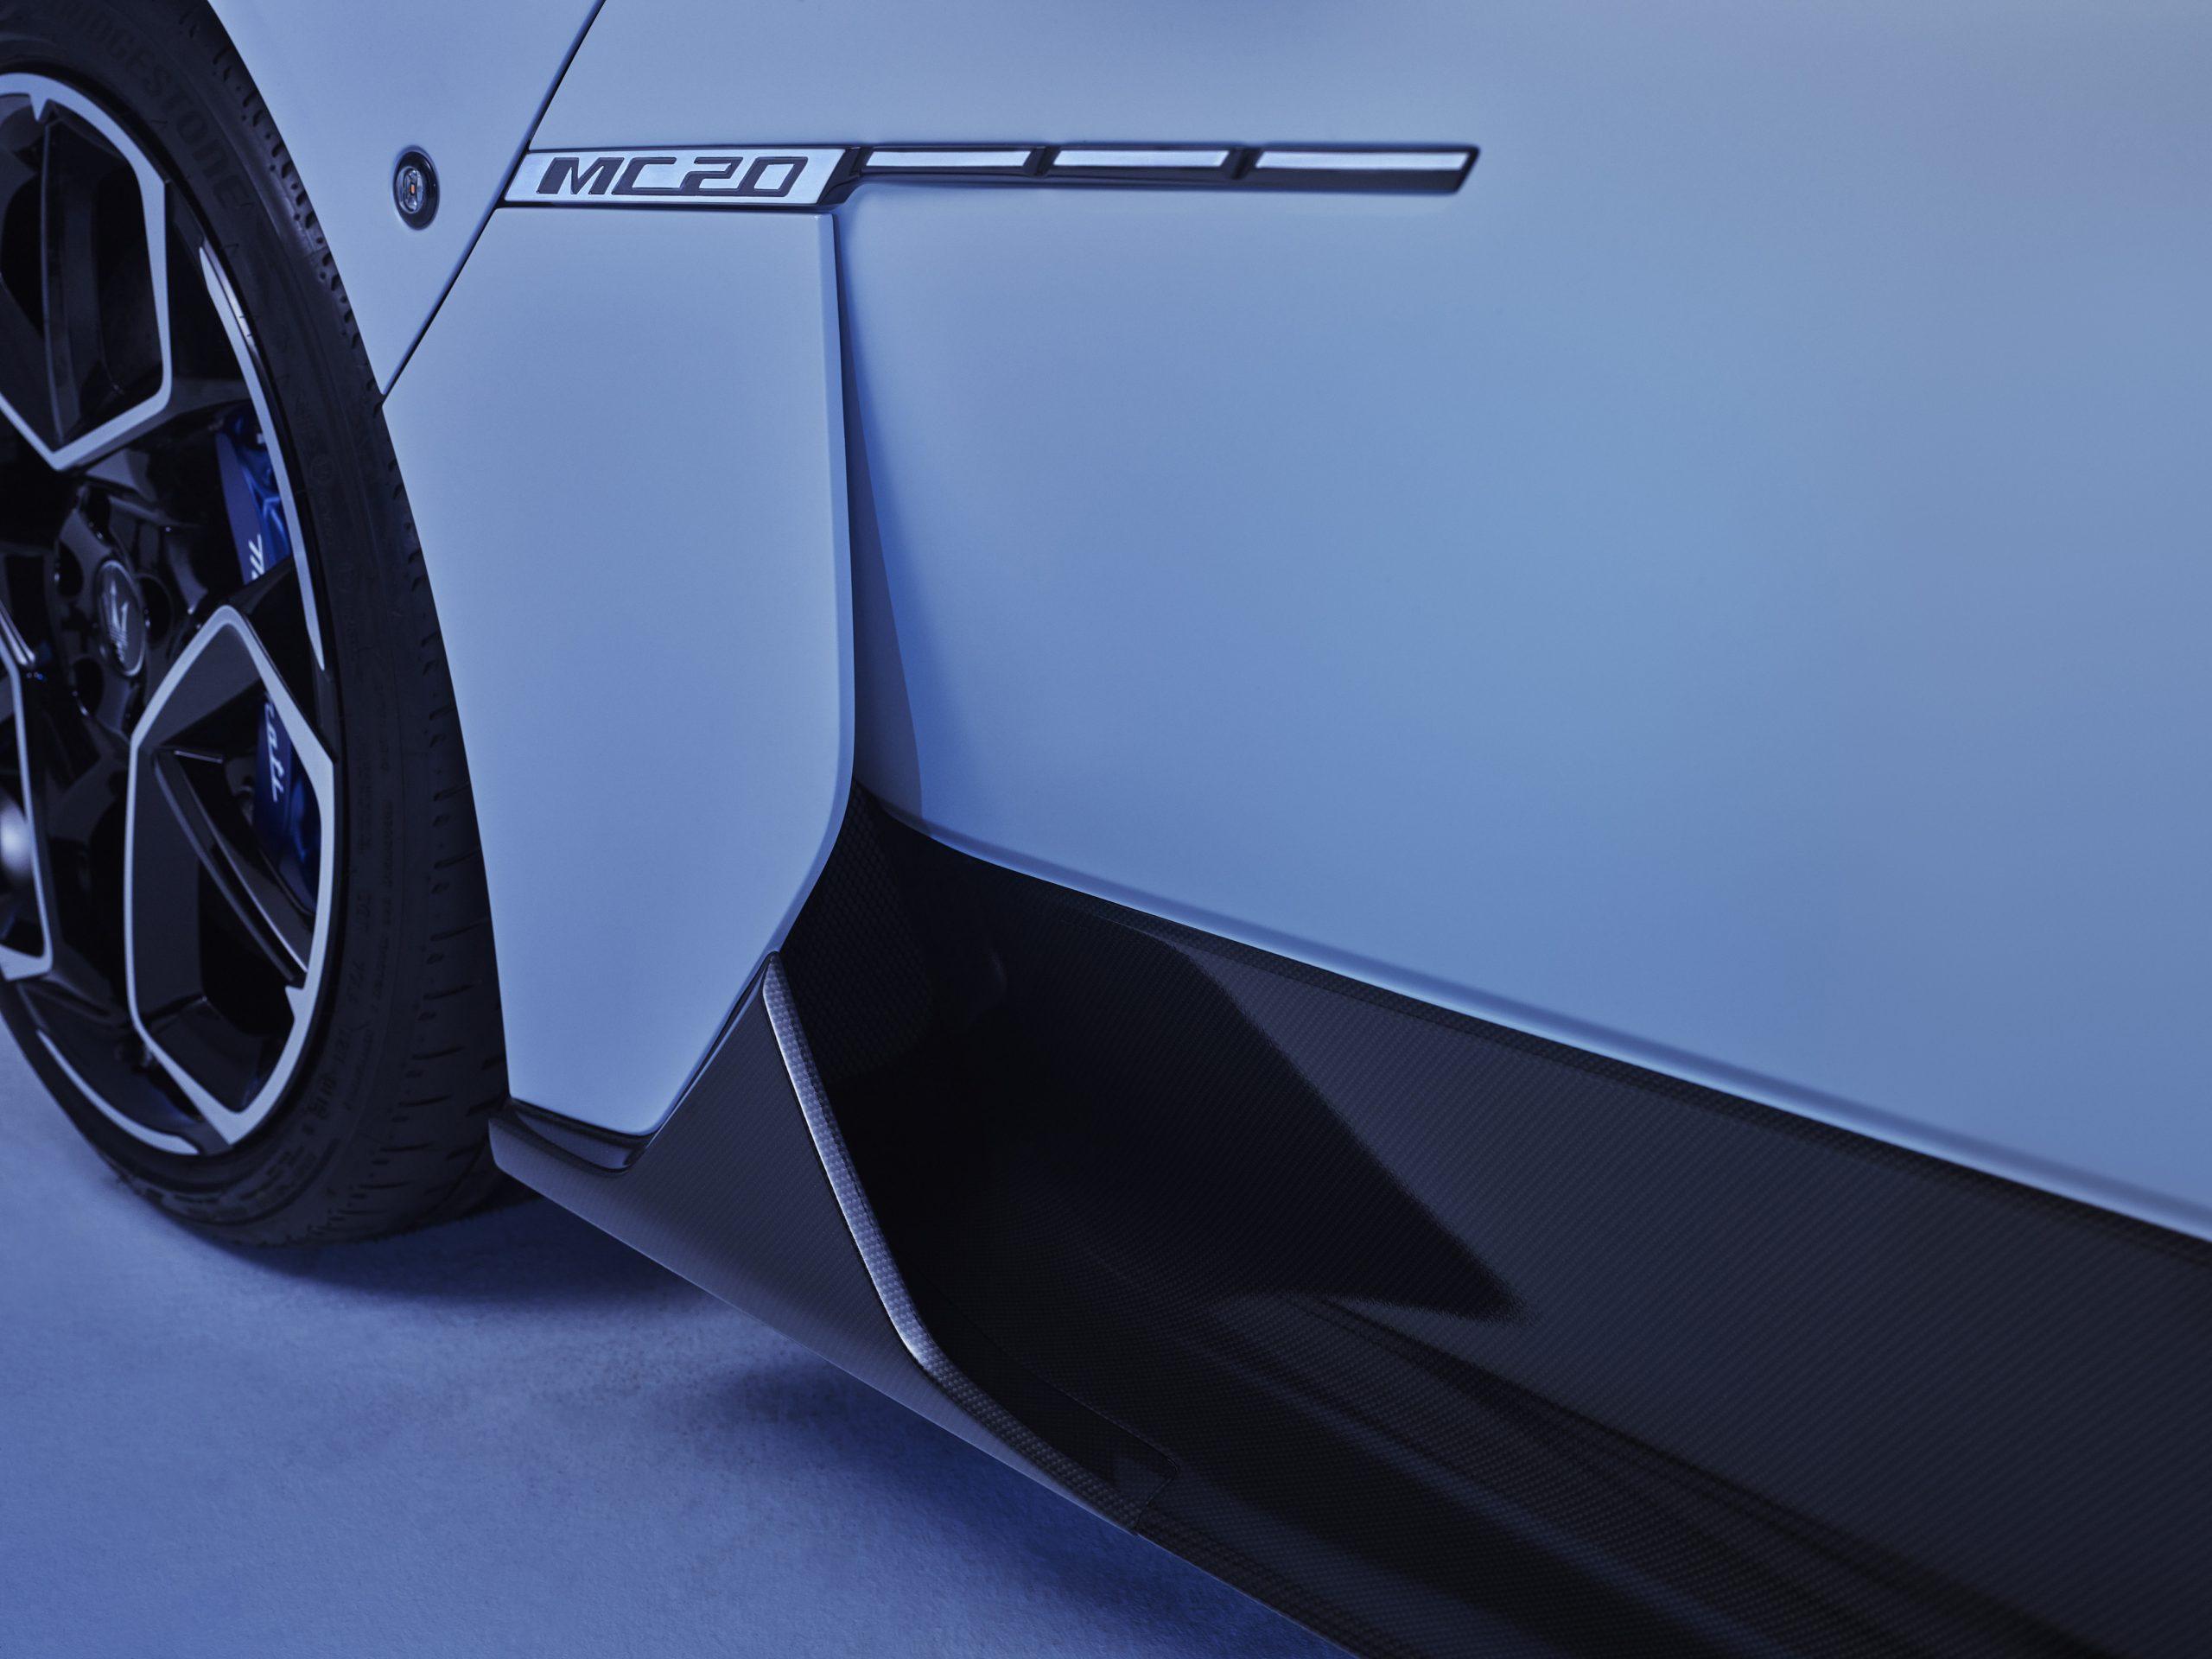 Maserati MC20 logo brake duct